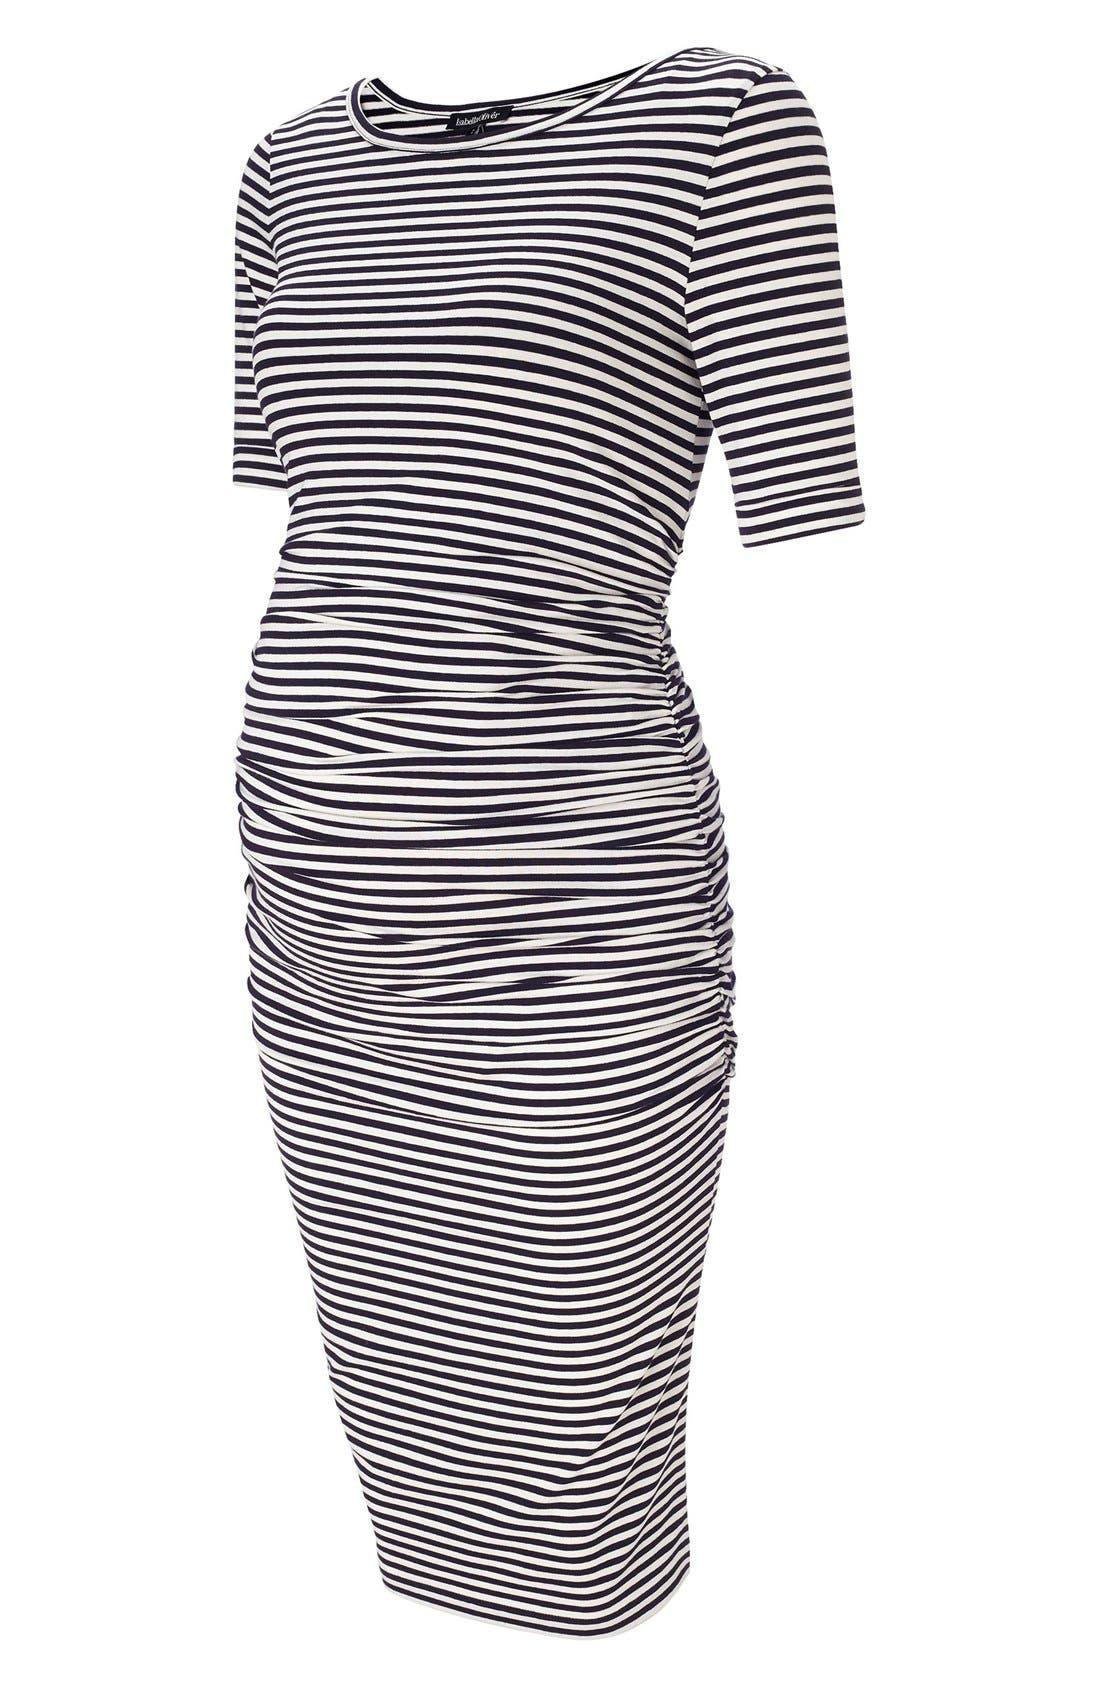 Arlington Stripe Maternity Dress,                         Main,                         color, Navy/ Off White